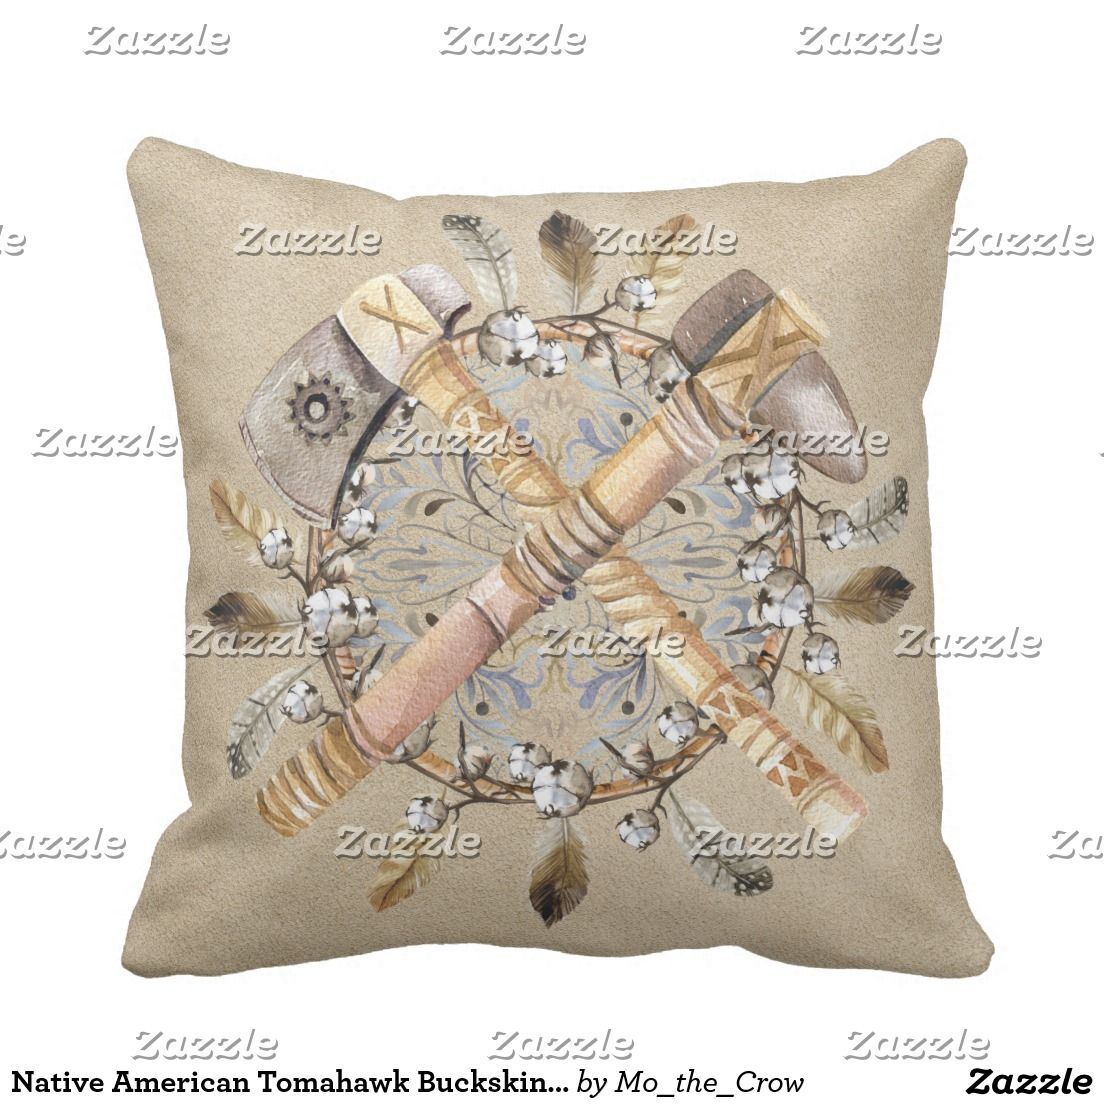 Native American Tomahawk Buckskin Suede Pillow